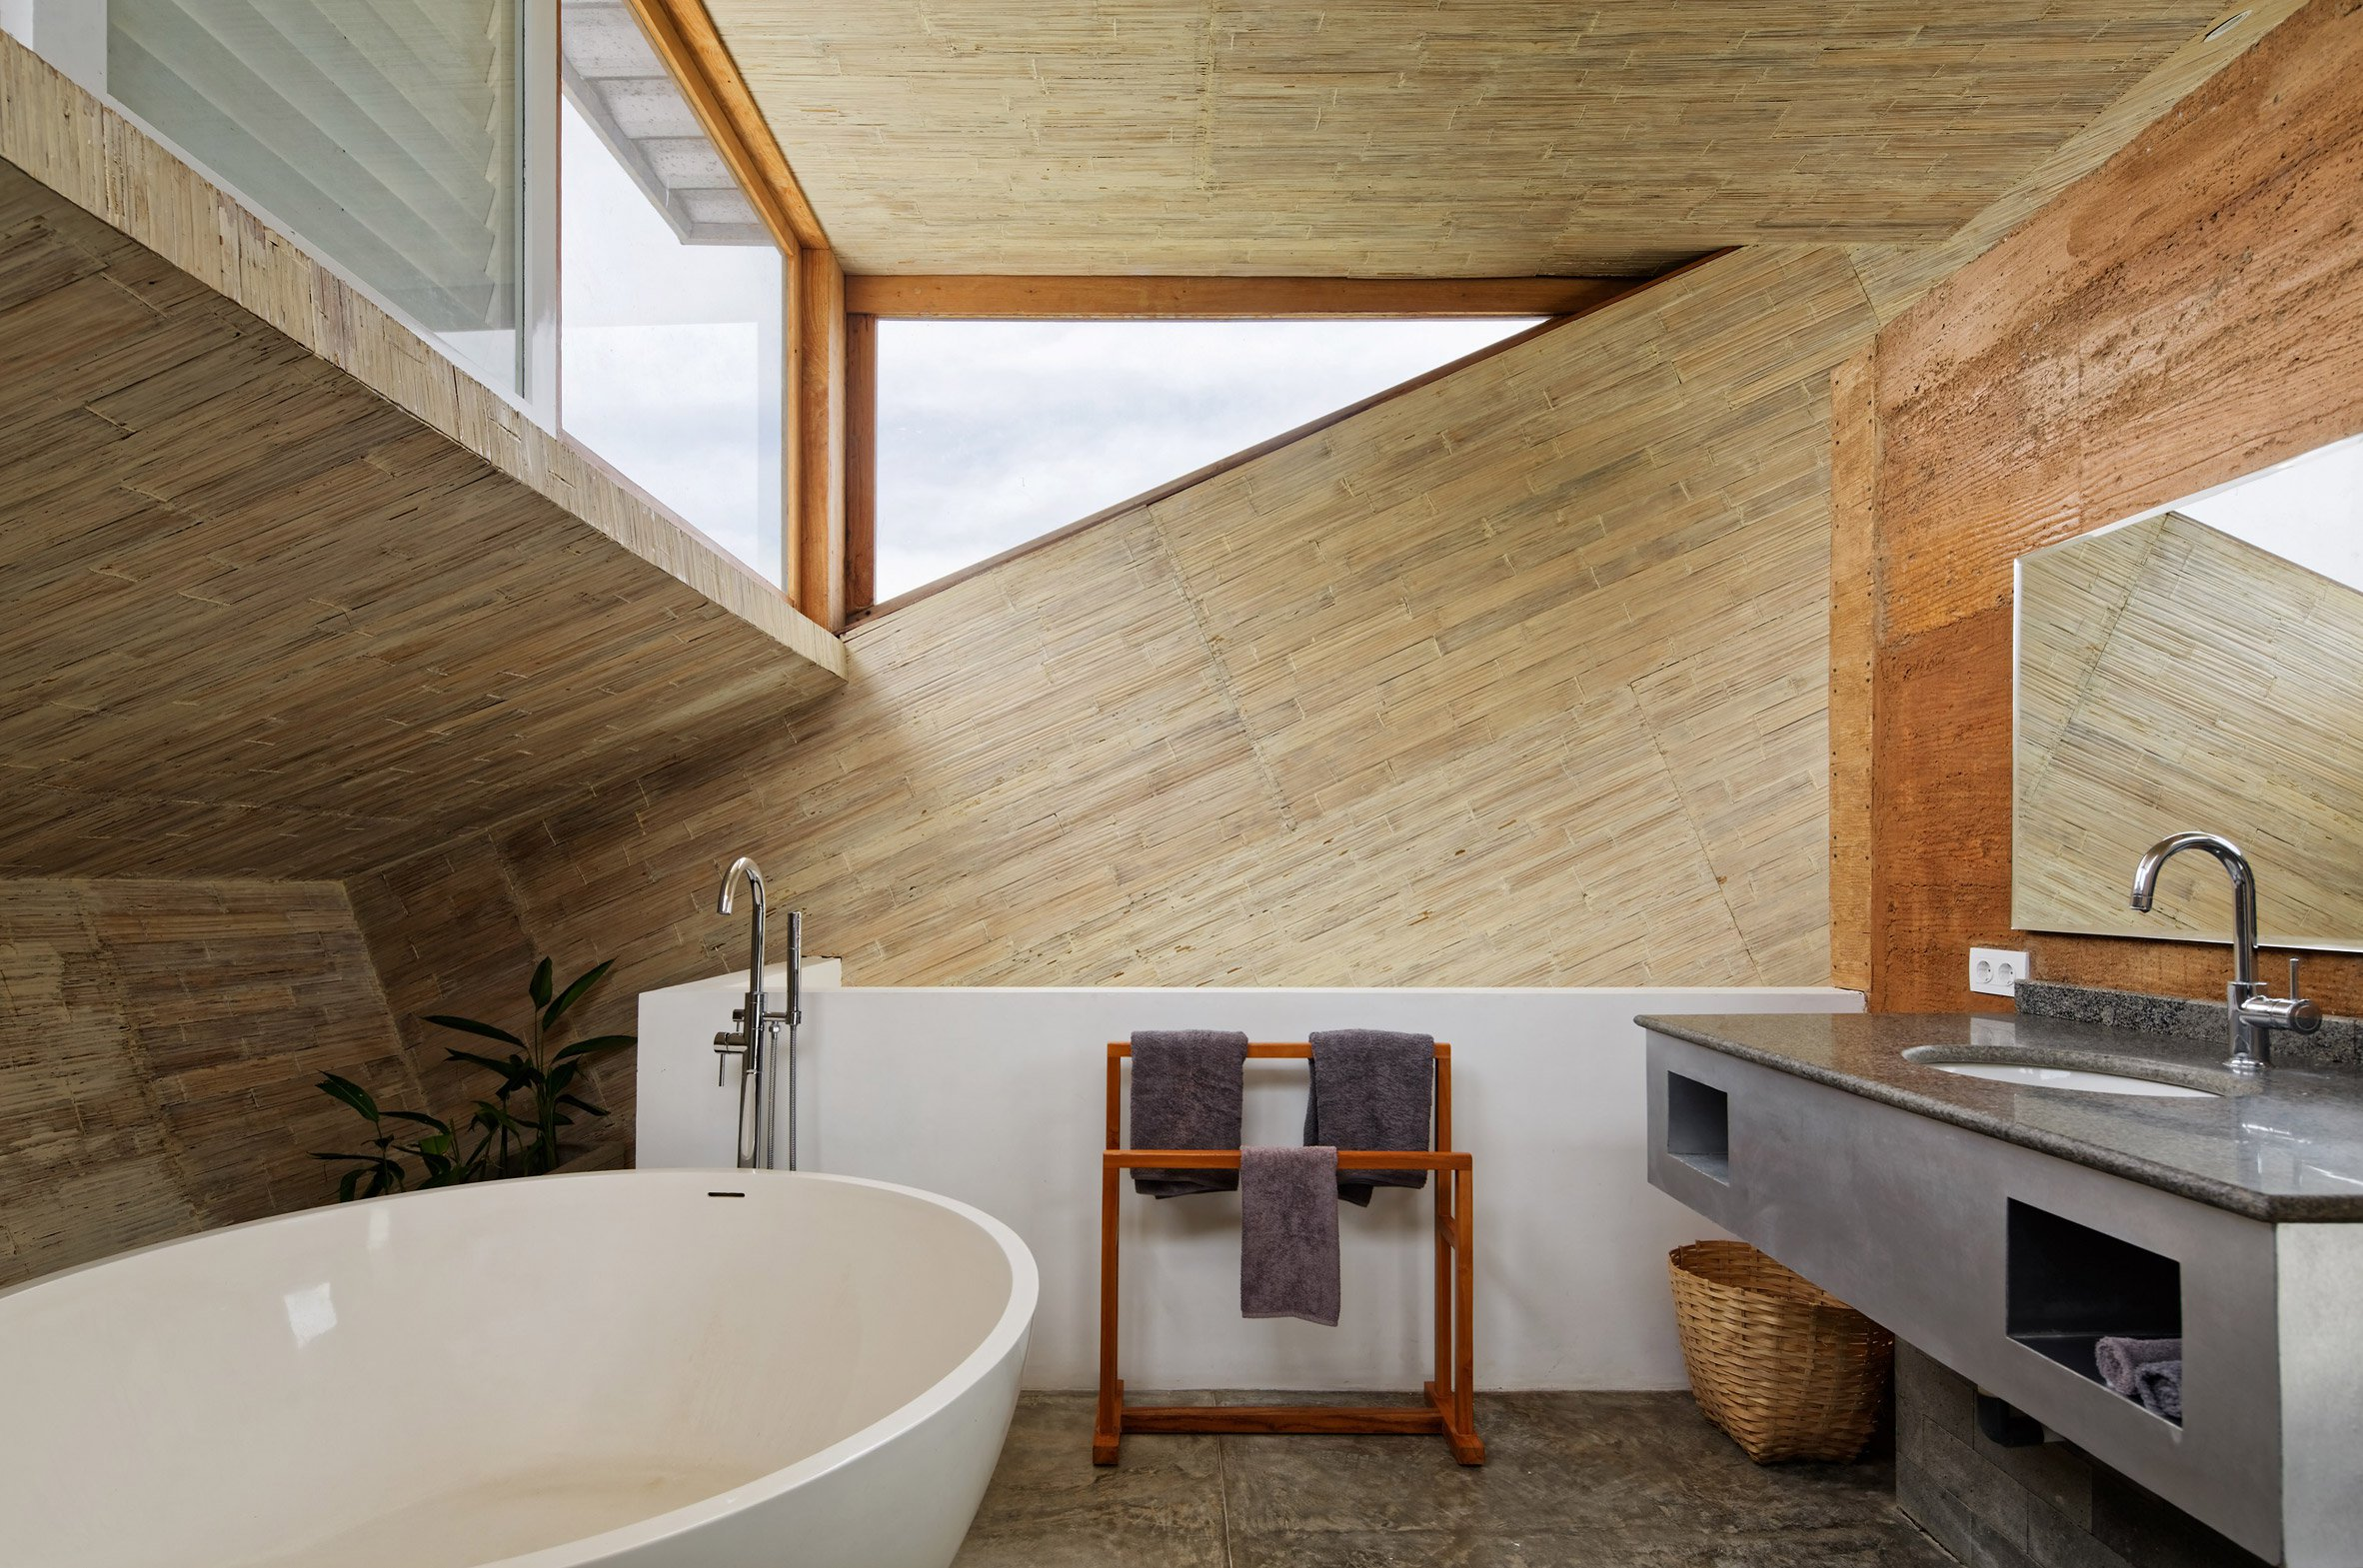 clay-house-budi-pradono-architects-architecture_dezeen_2364_col_16-1704x1131.jpg